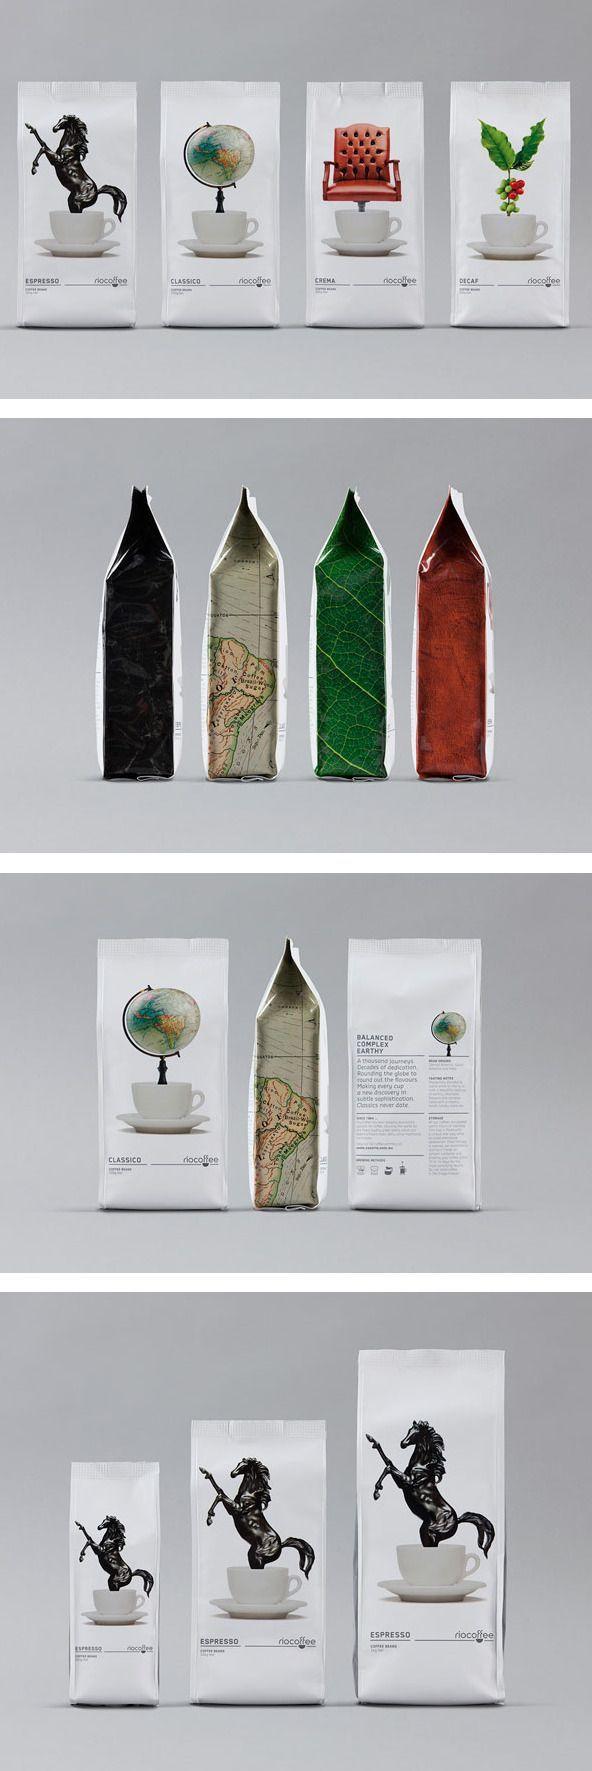 Rio Coffee designed by Voice (Adelaide Australia) PD # ...